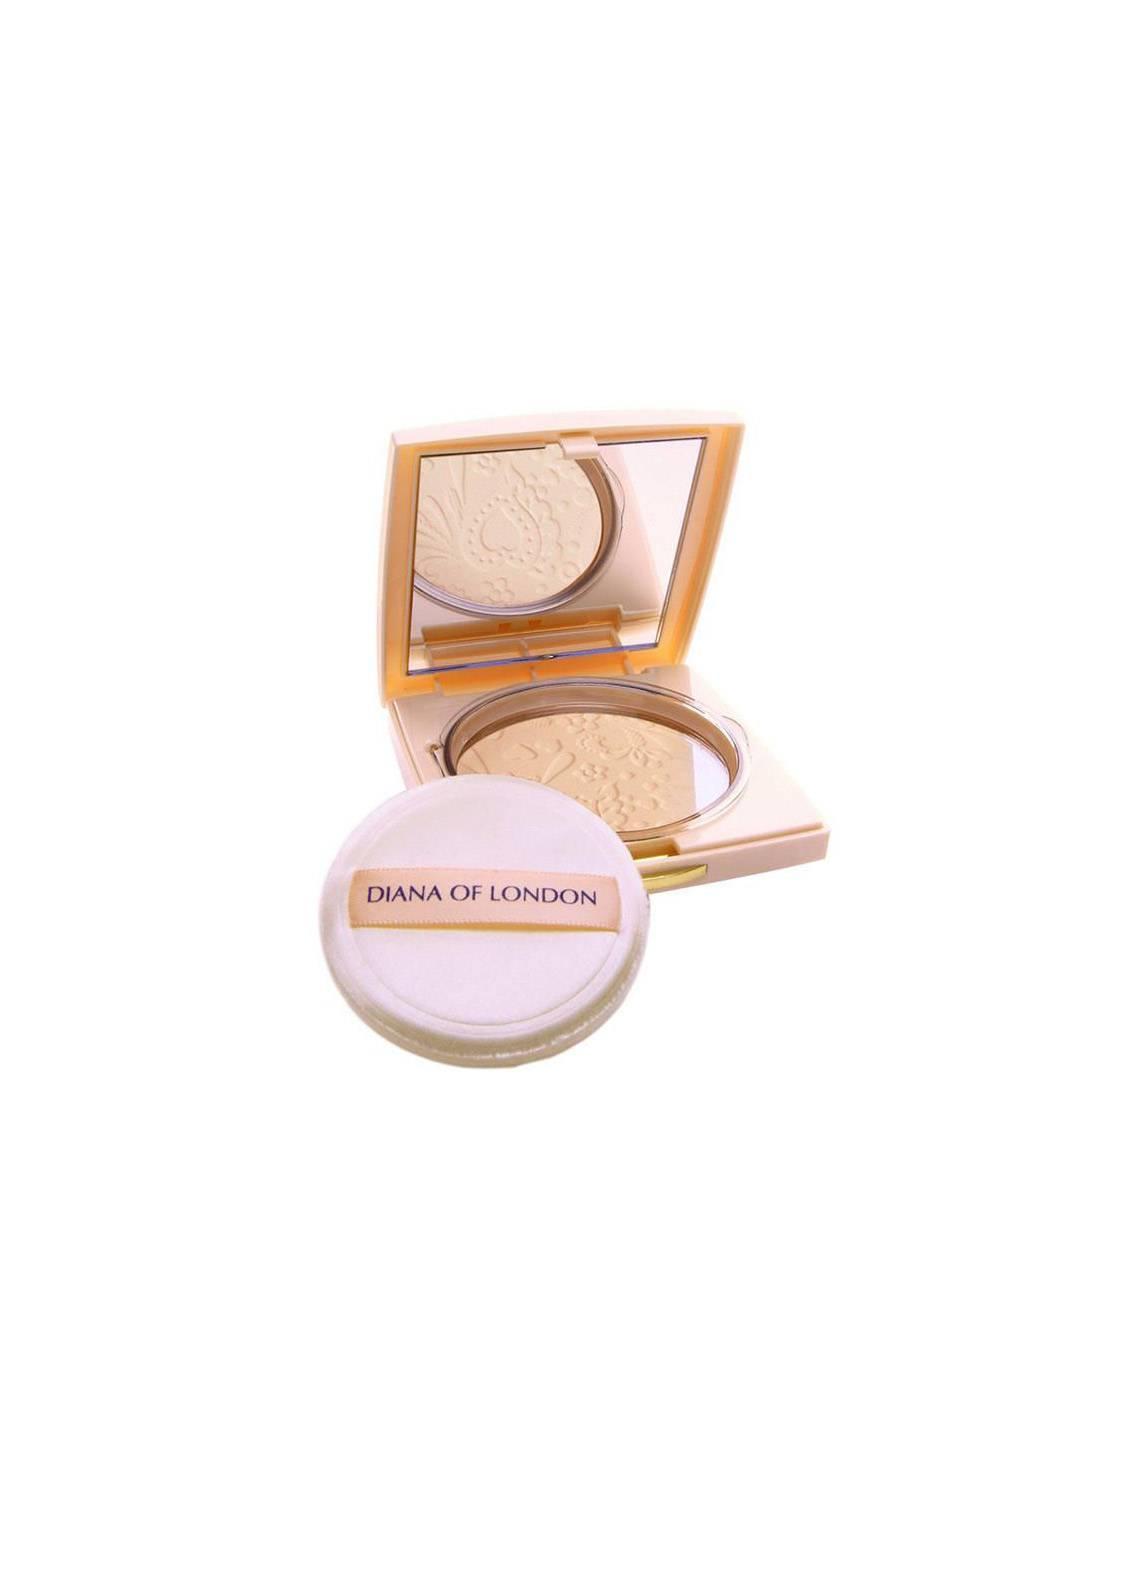 Diana Of London Absolute Compact Powder - Porcelain Magic-401